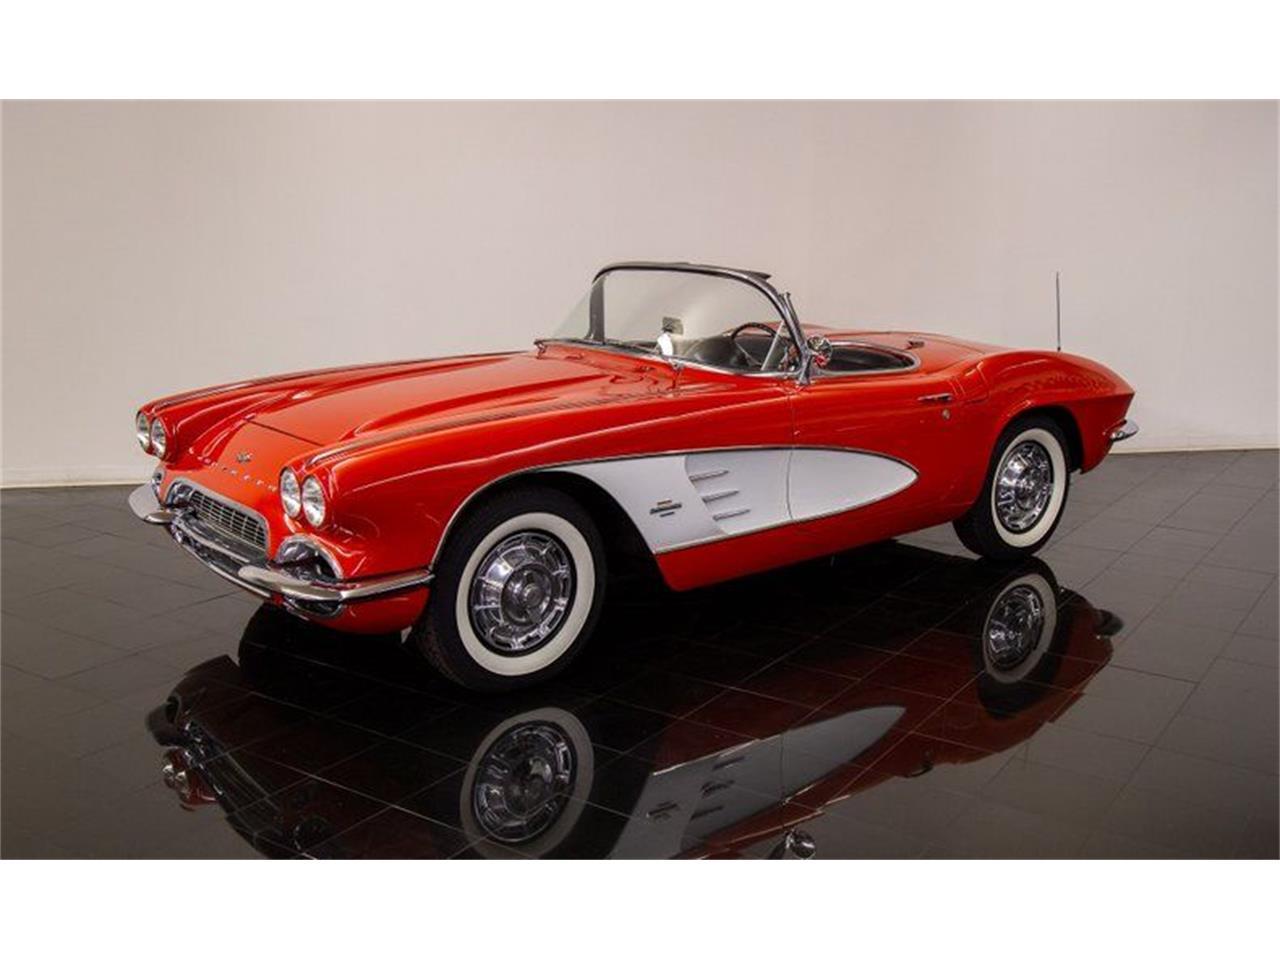 for sale 1961 chevrolet corvette in st. louis, missouri cars - saint louis, mo at geebo